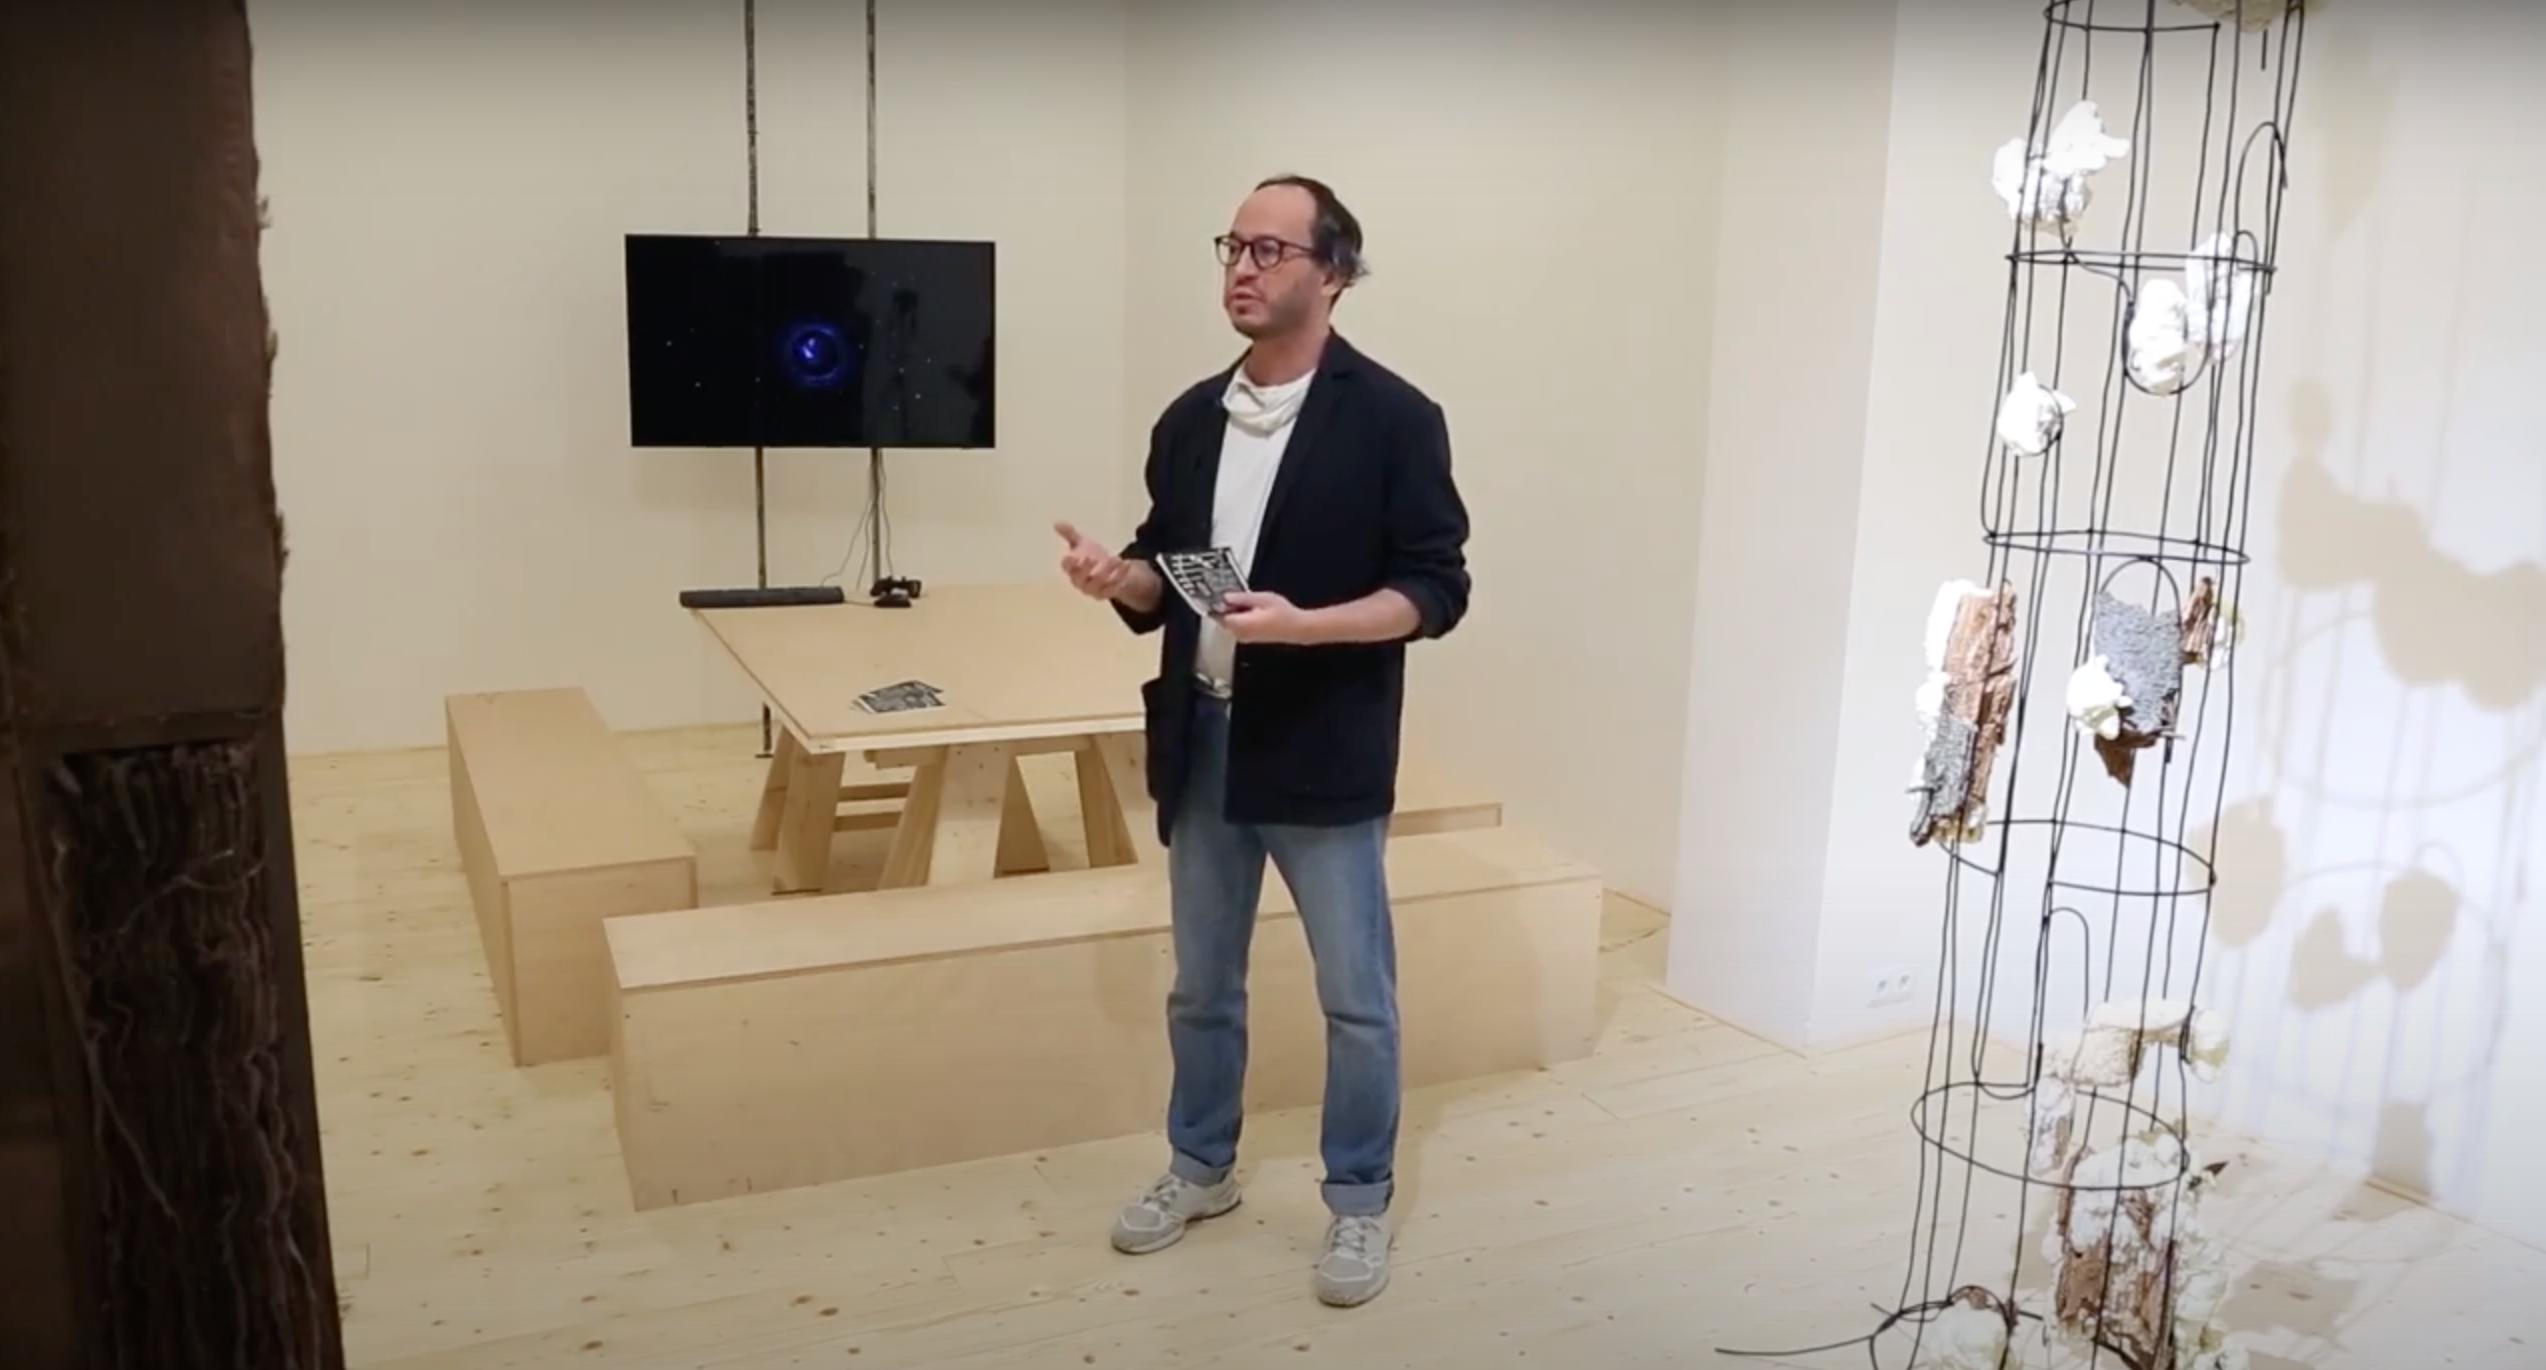 Michal Machciník – Overview fact Galerie Kurzor / Václav Janoščík